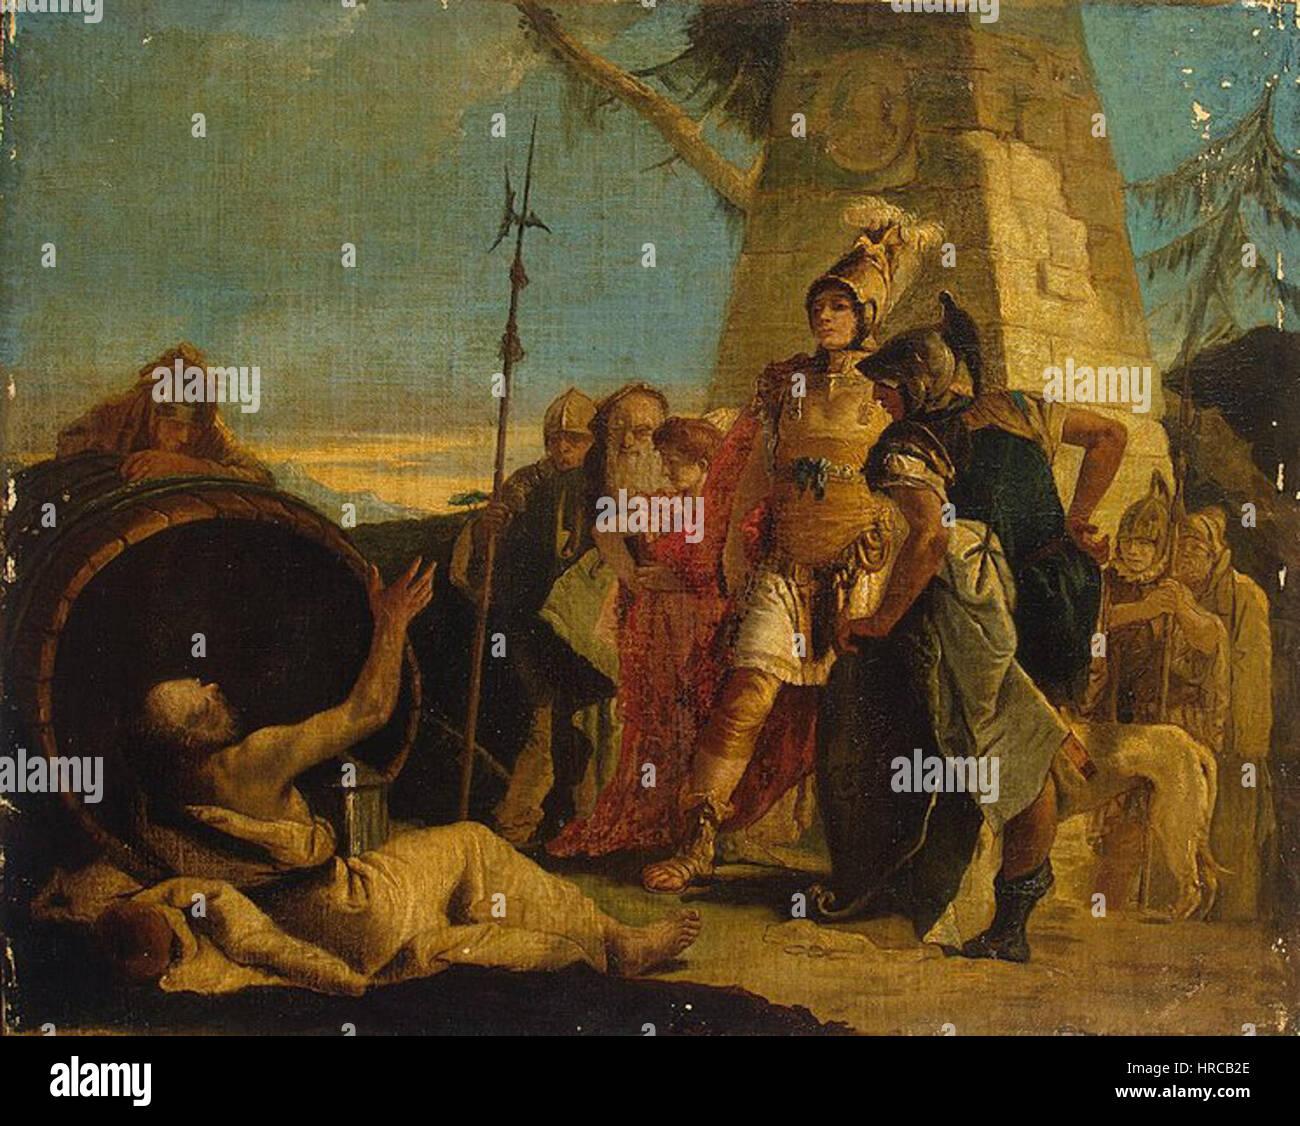 Giovanni Battista Tiepolo - Alexander the Great and Diogenes Stock Photo